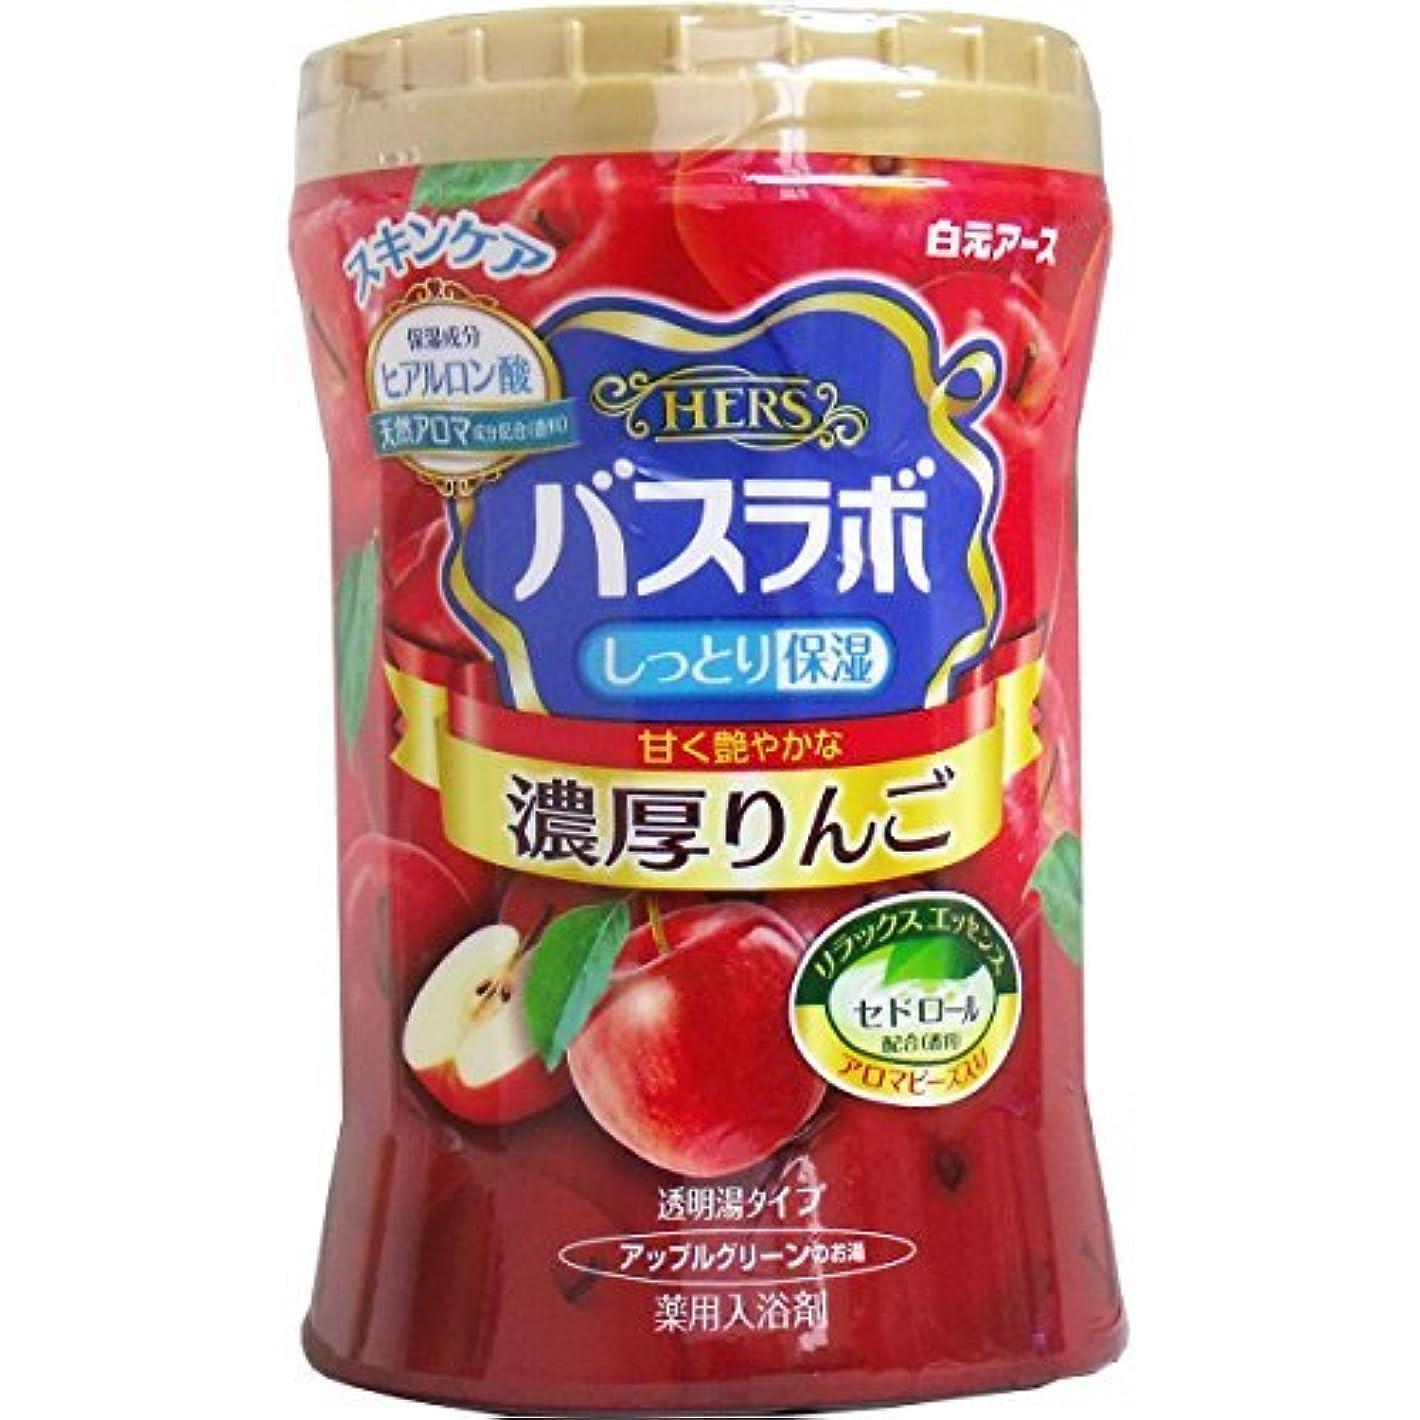 HERSバスラボボトル 濃厚りんごの香り640G × 15個セット